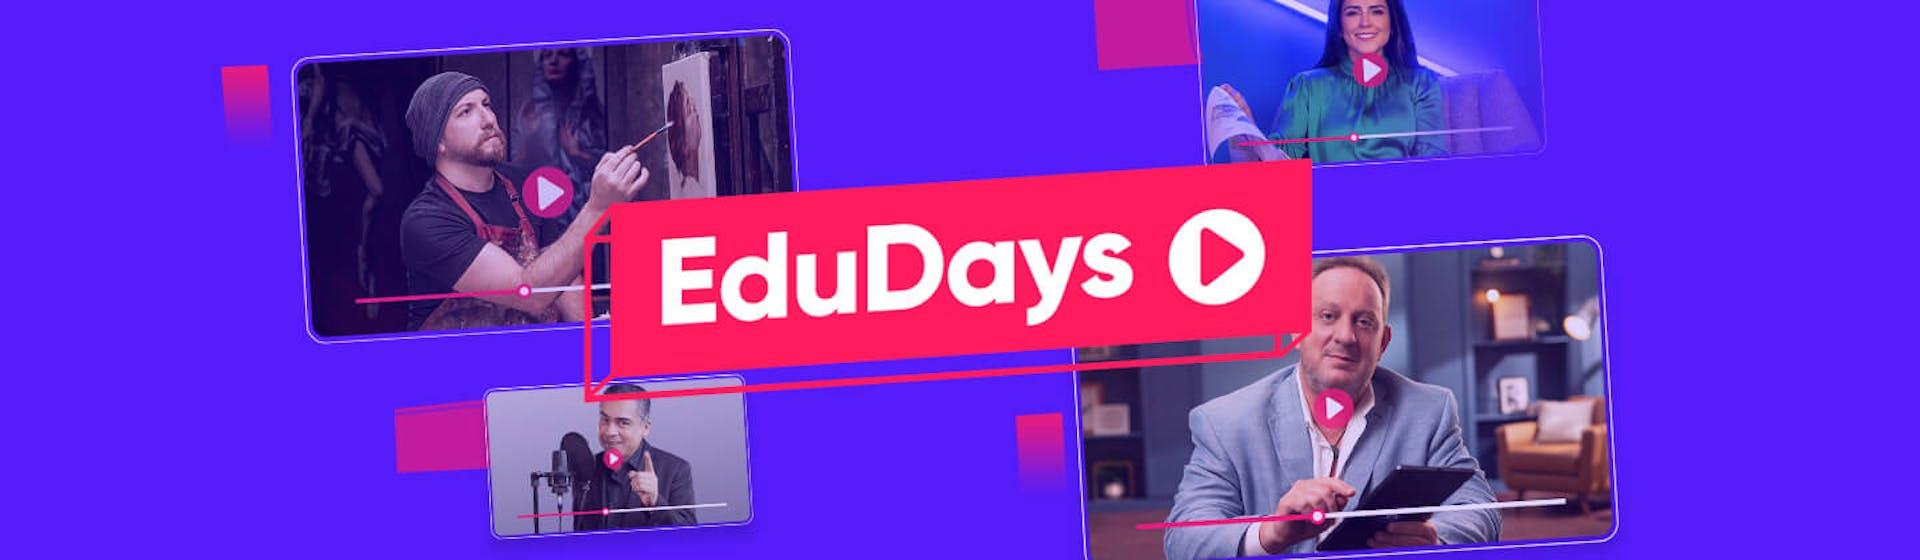 EduDays Crehana ¡2 semanas para potenciar tu aprendizaje al máximo!